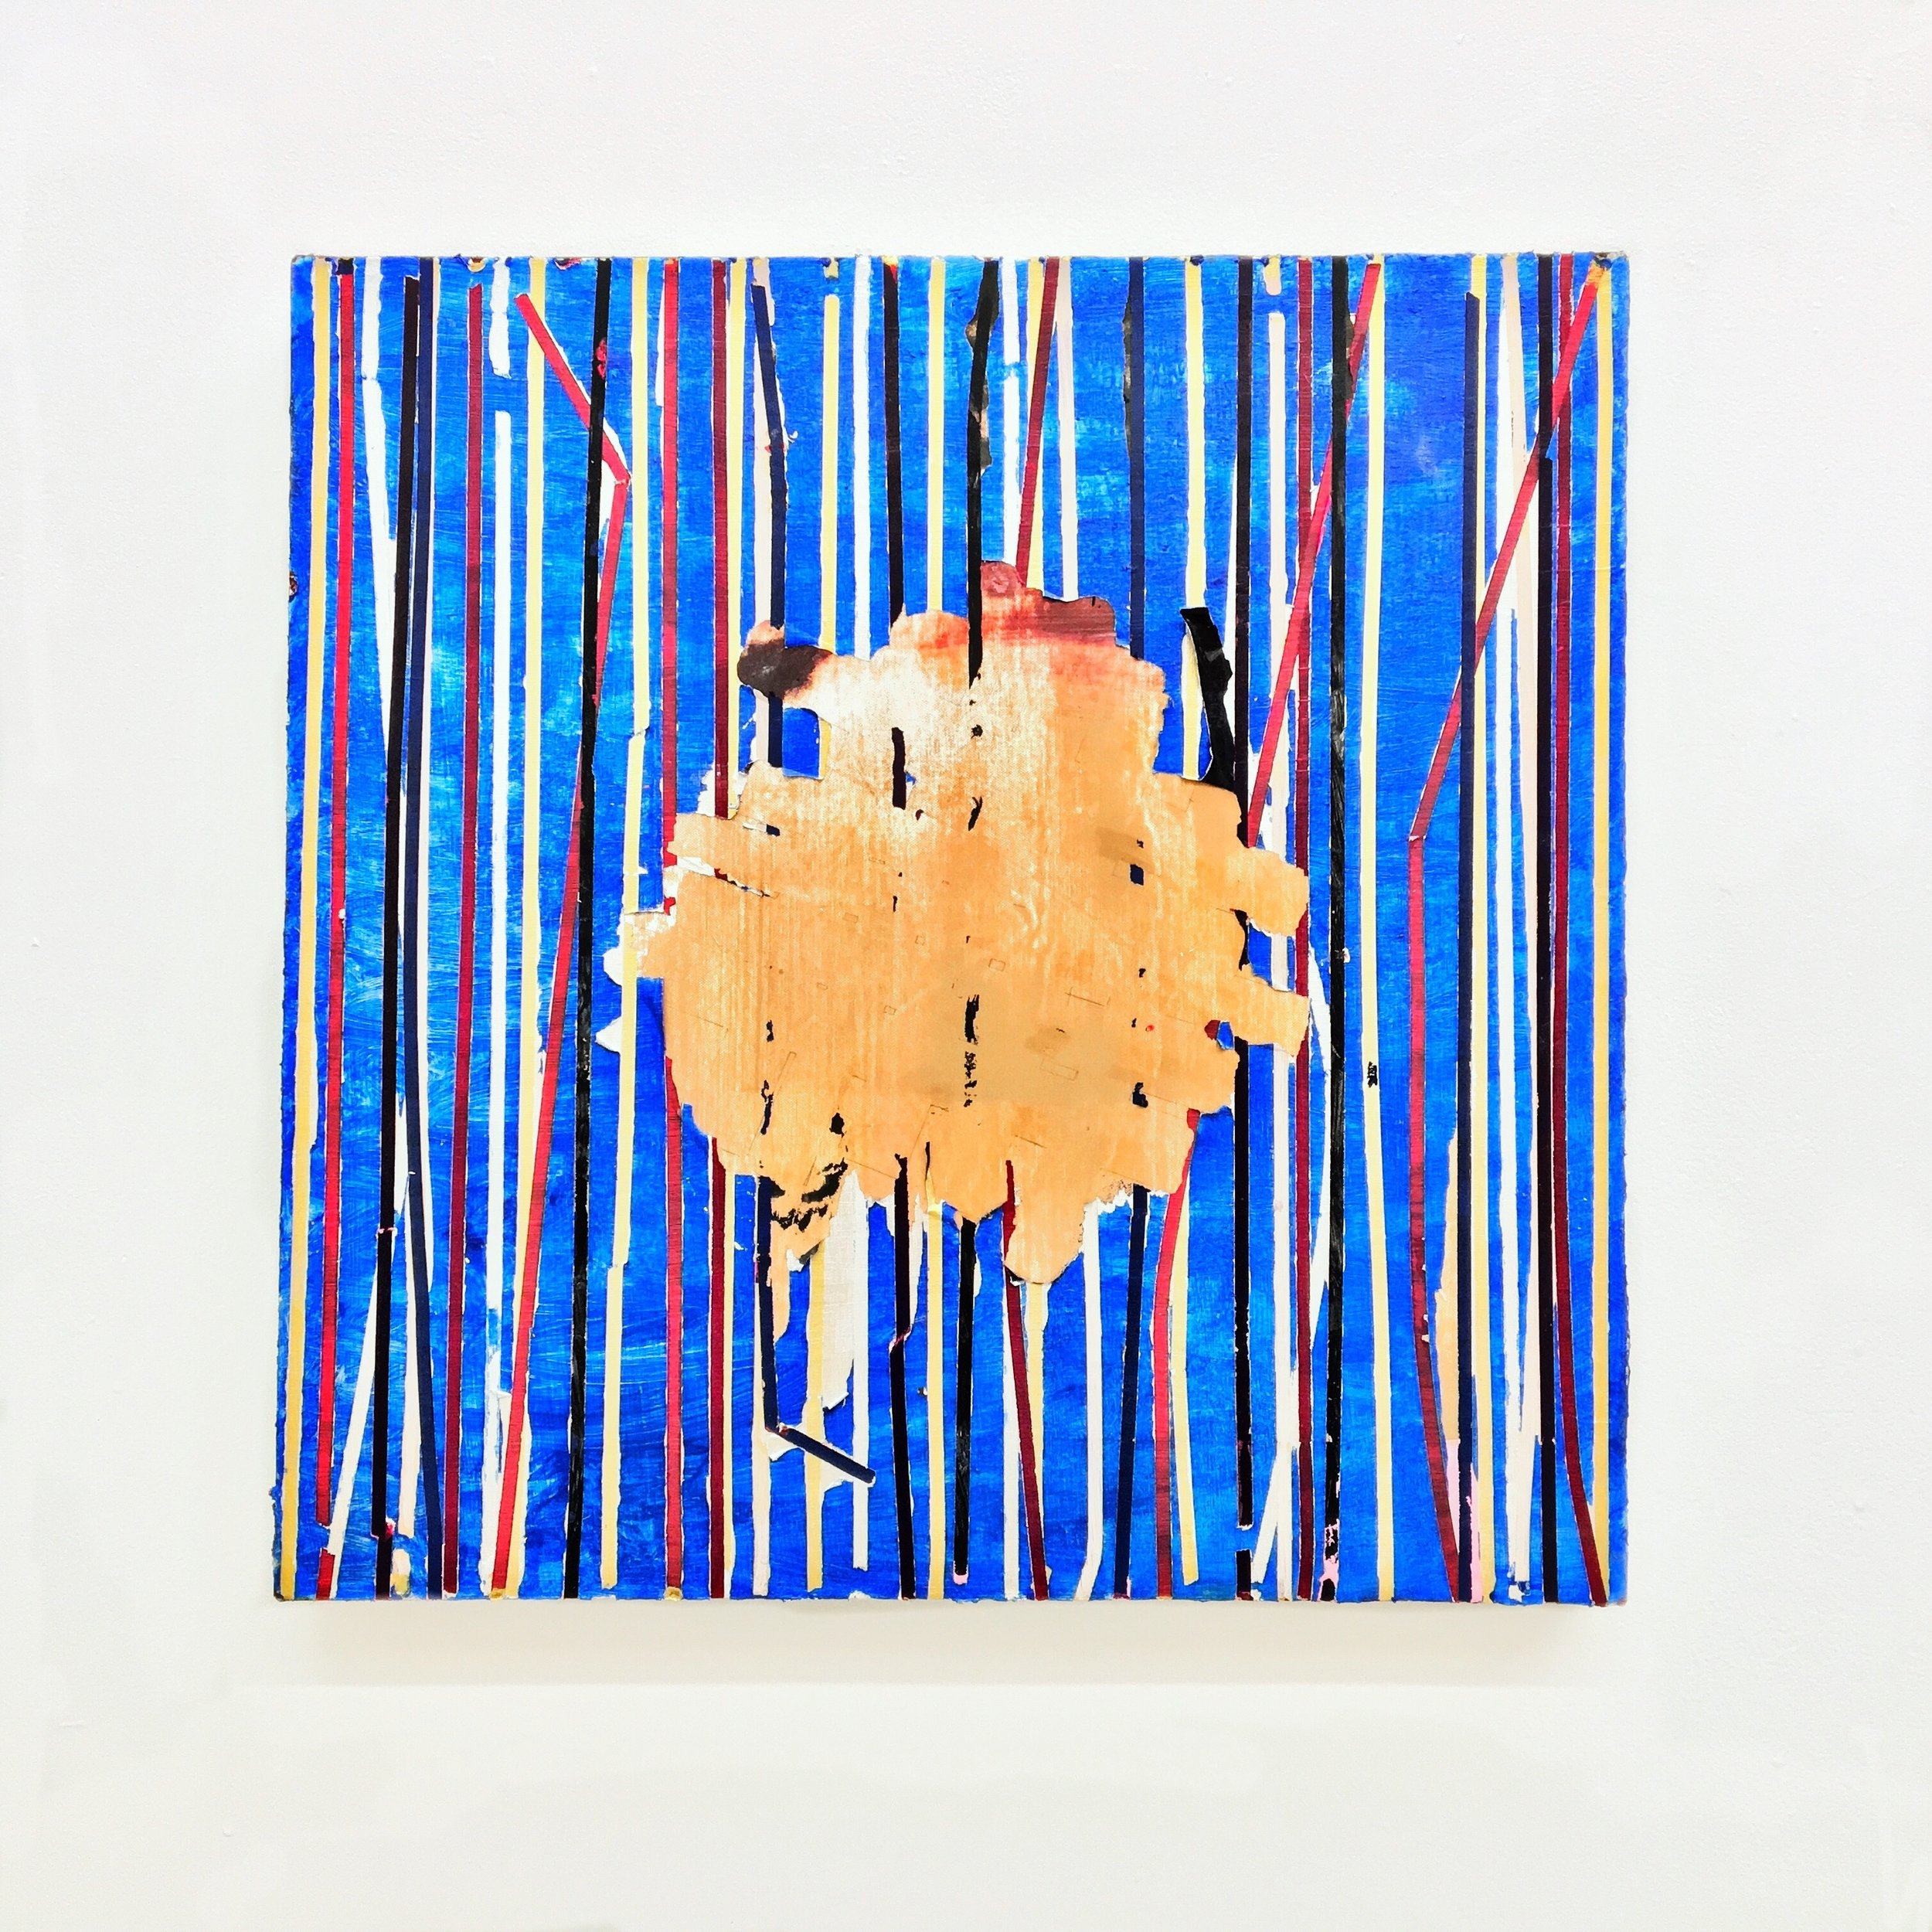 IAIN MUIRHEAD   1627  , 2014-2016. Oil, airborne pigment, acrylic binder, 10oz cotton duck canvas, white titanium gesso, milled pine, lauan plywood,3mm staples, 16 gauge pneumatic nails. 23 x 23 inches.